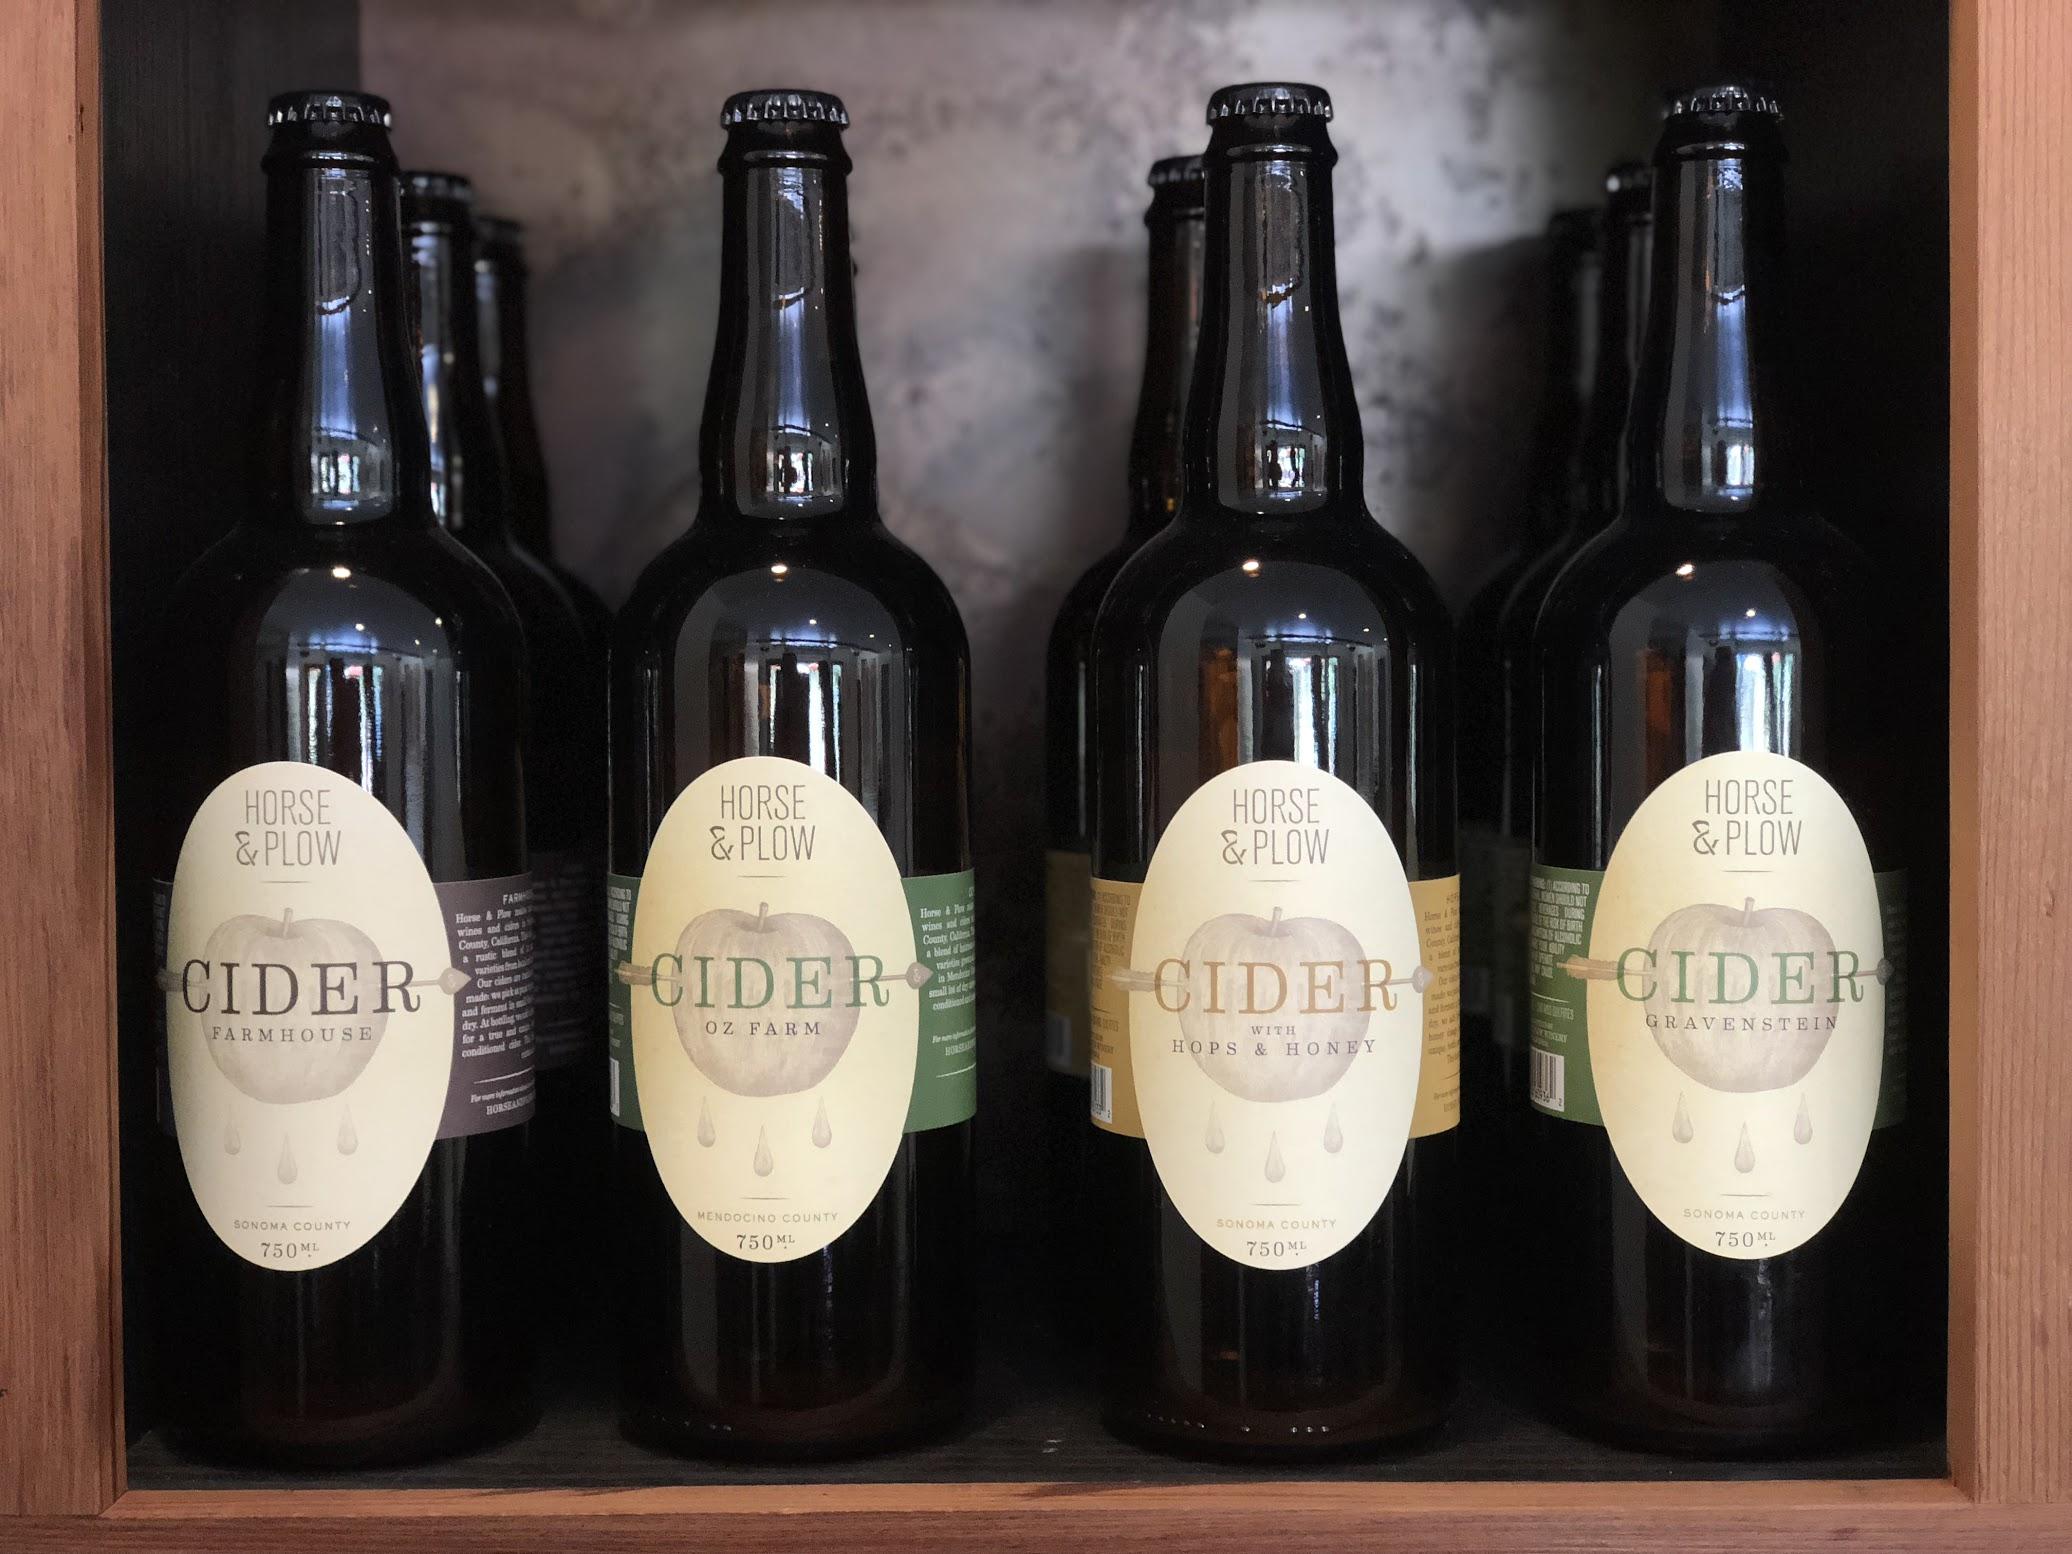 Horse & Plow Cider